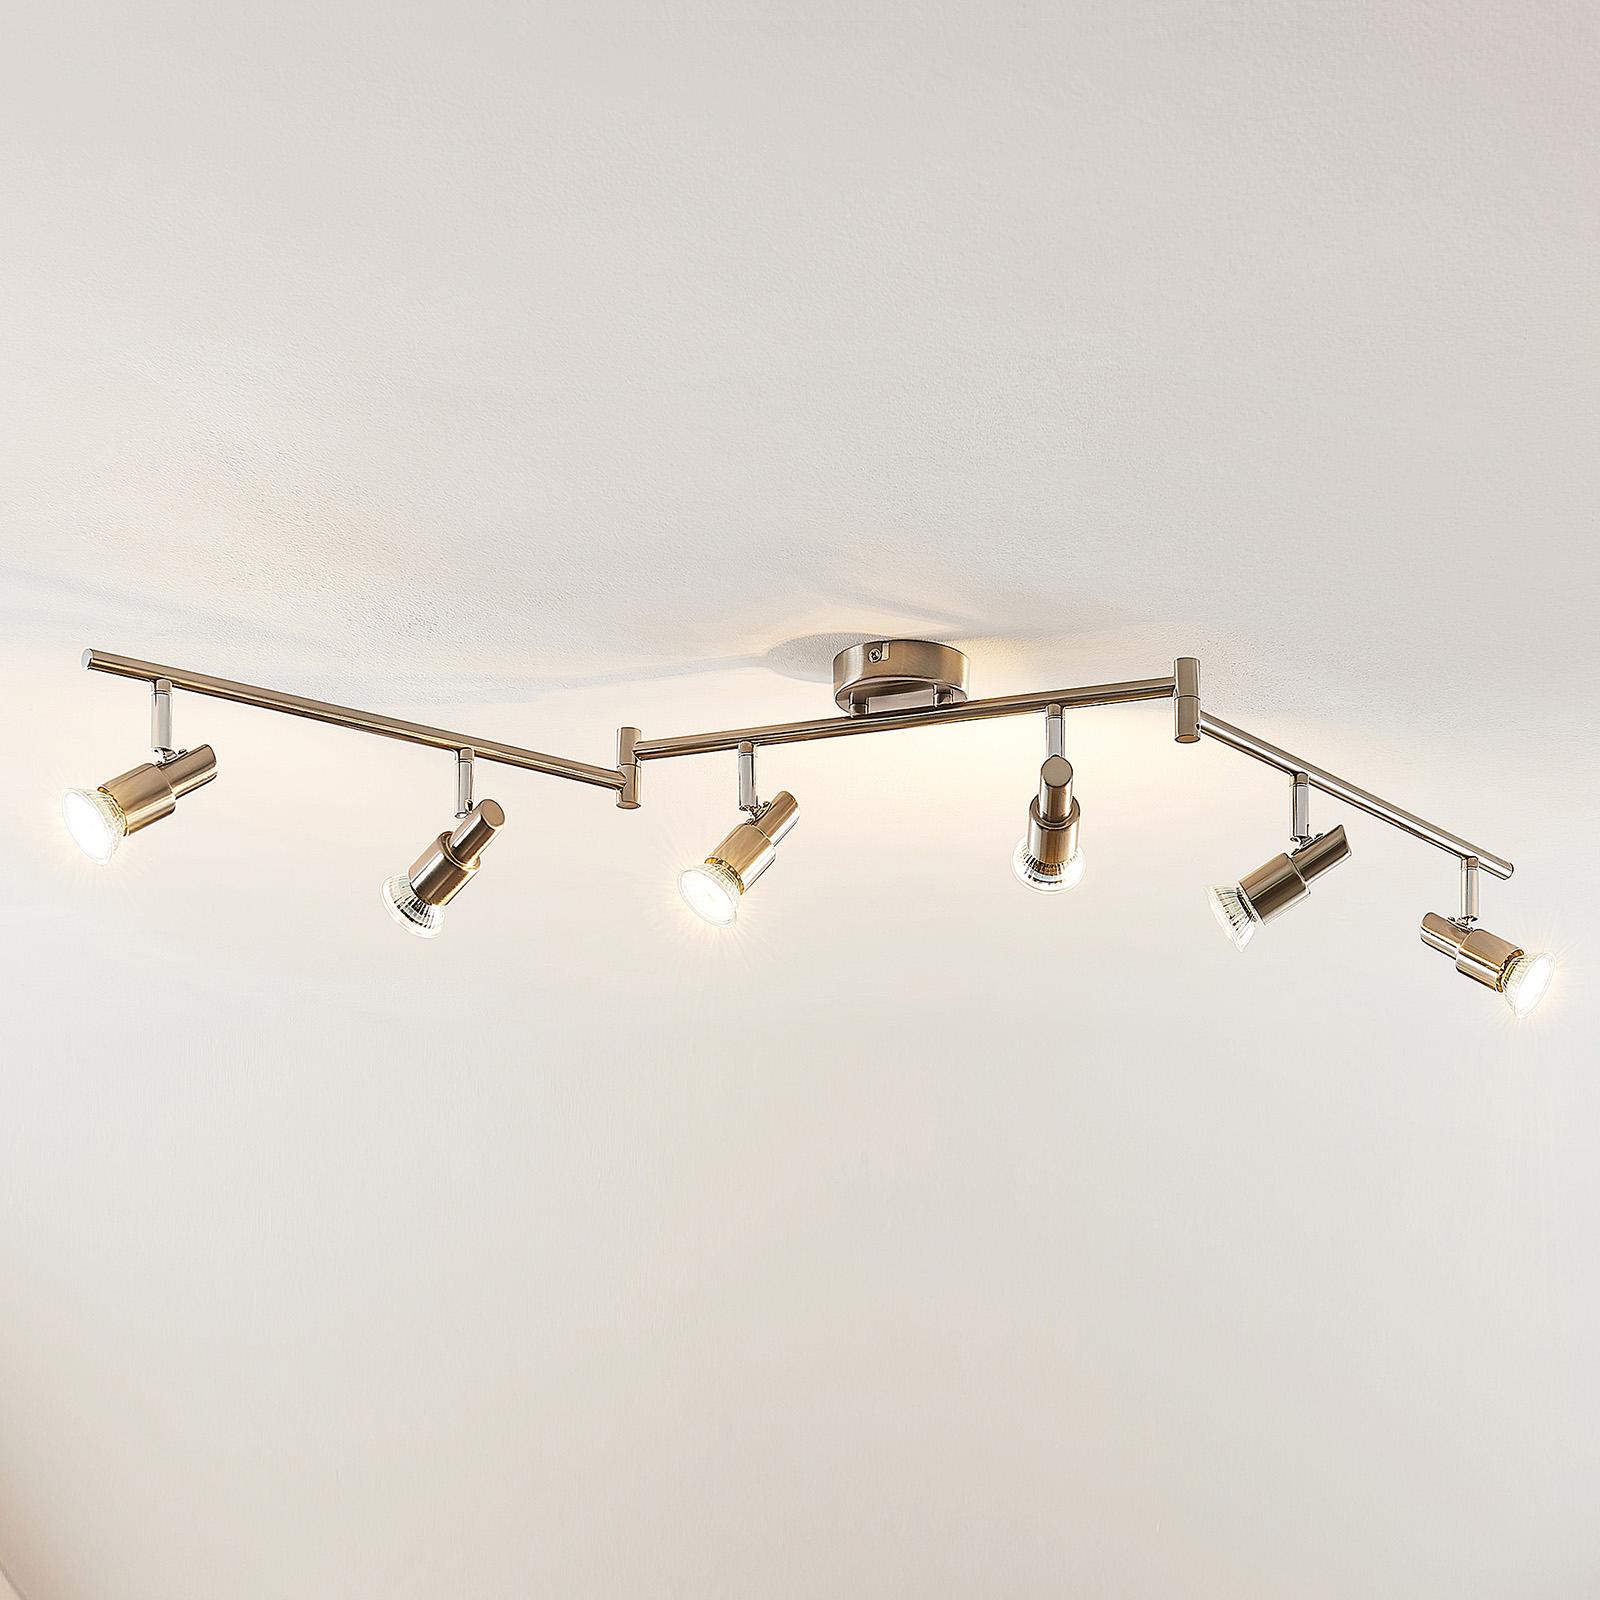 ELC Farida LED-taklampa, nickel, 6 lampor